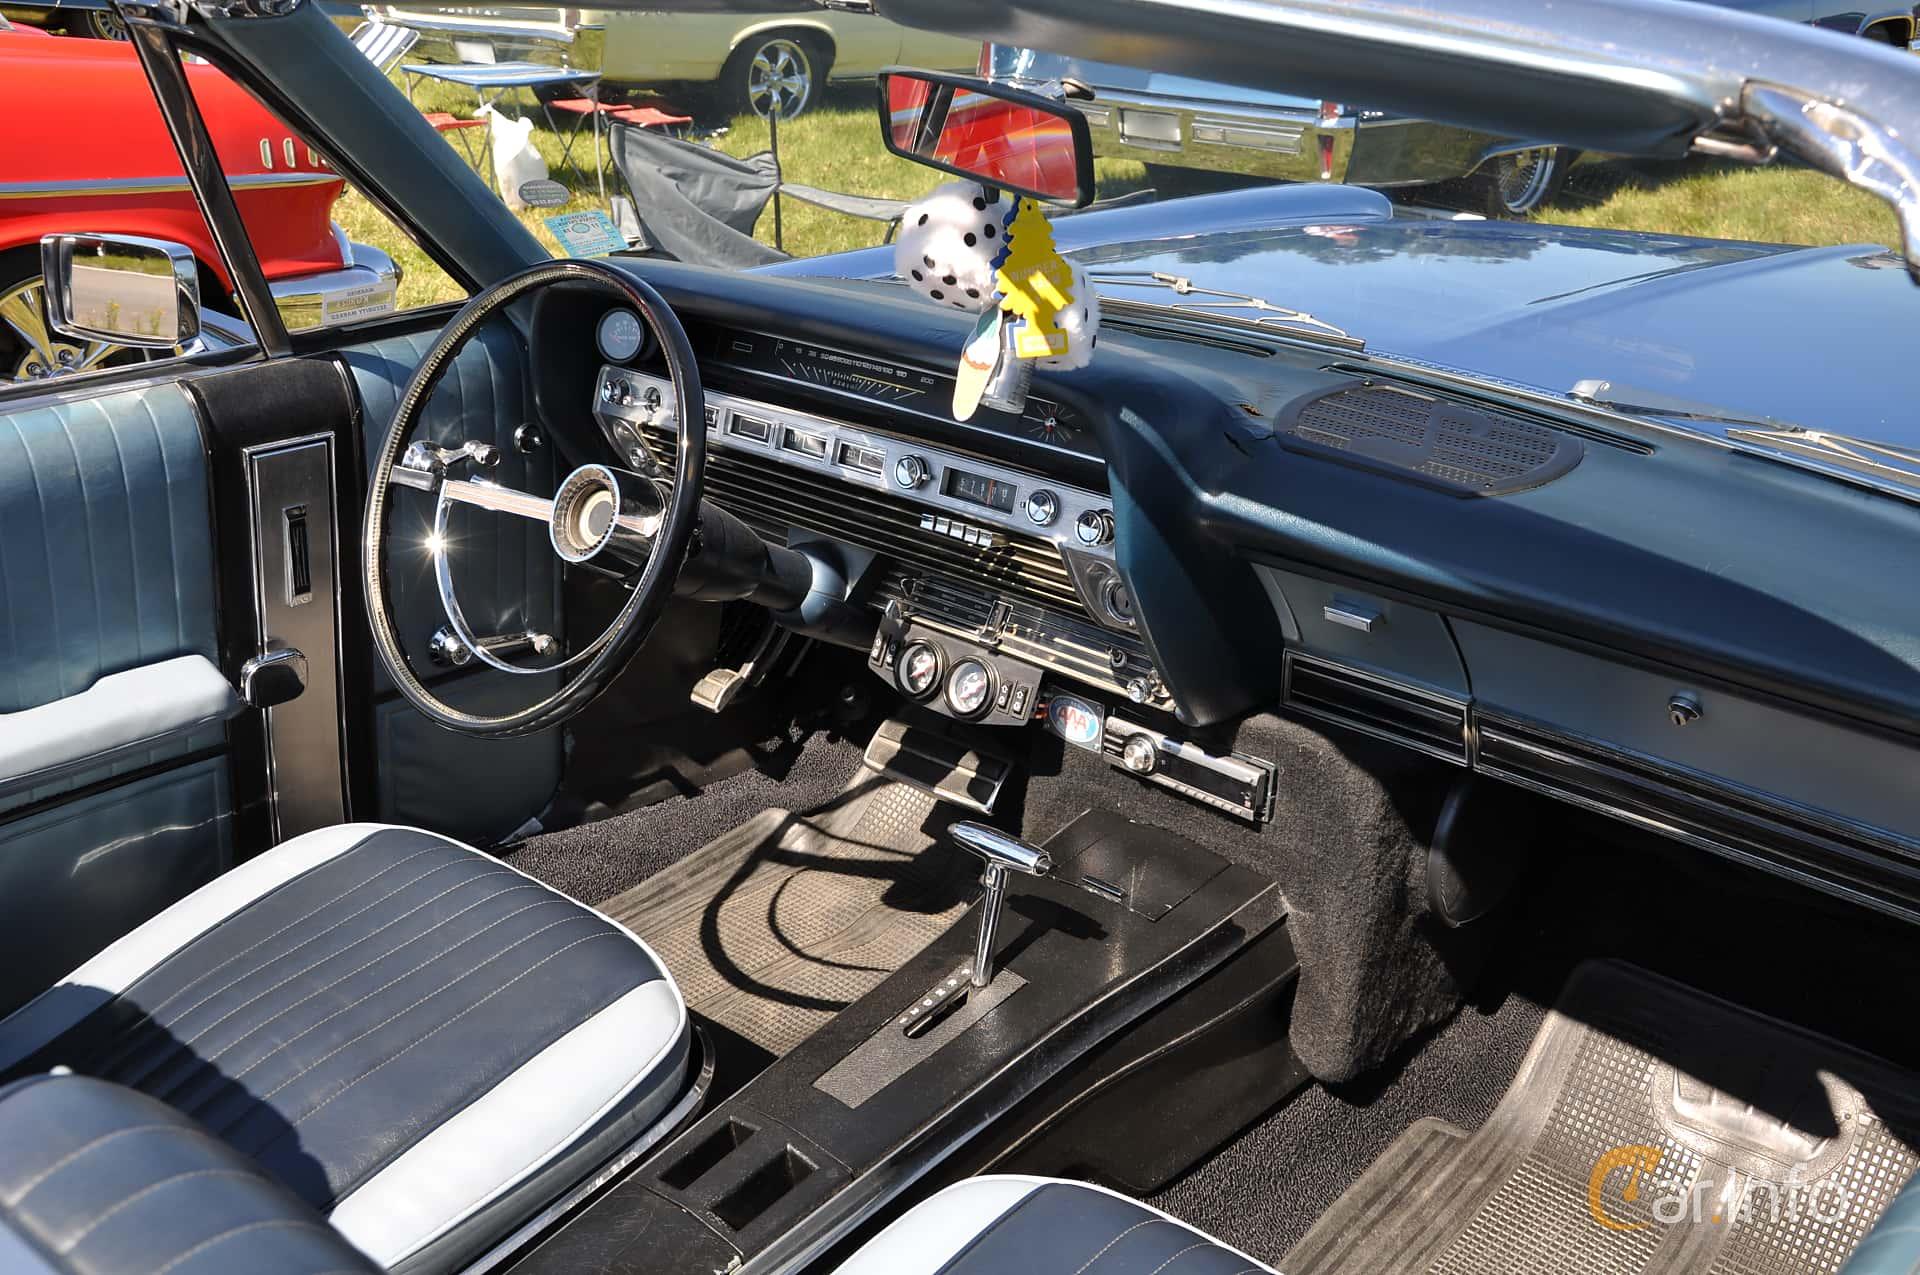 Ford XL Convertible 6.4 V8 Automatic, 274hp, 1967 at Wheels & Wings 2013